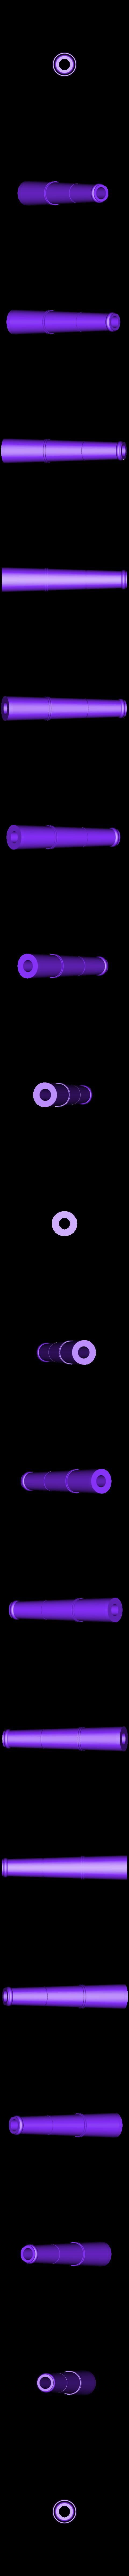 7_DuckfootGun_Barrel_PRINTX4.stl Download free STL file Duck's foot gun • Object to 3D print, Snorri